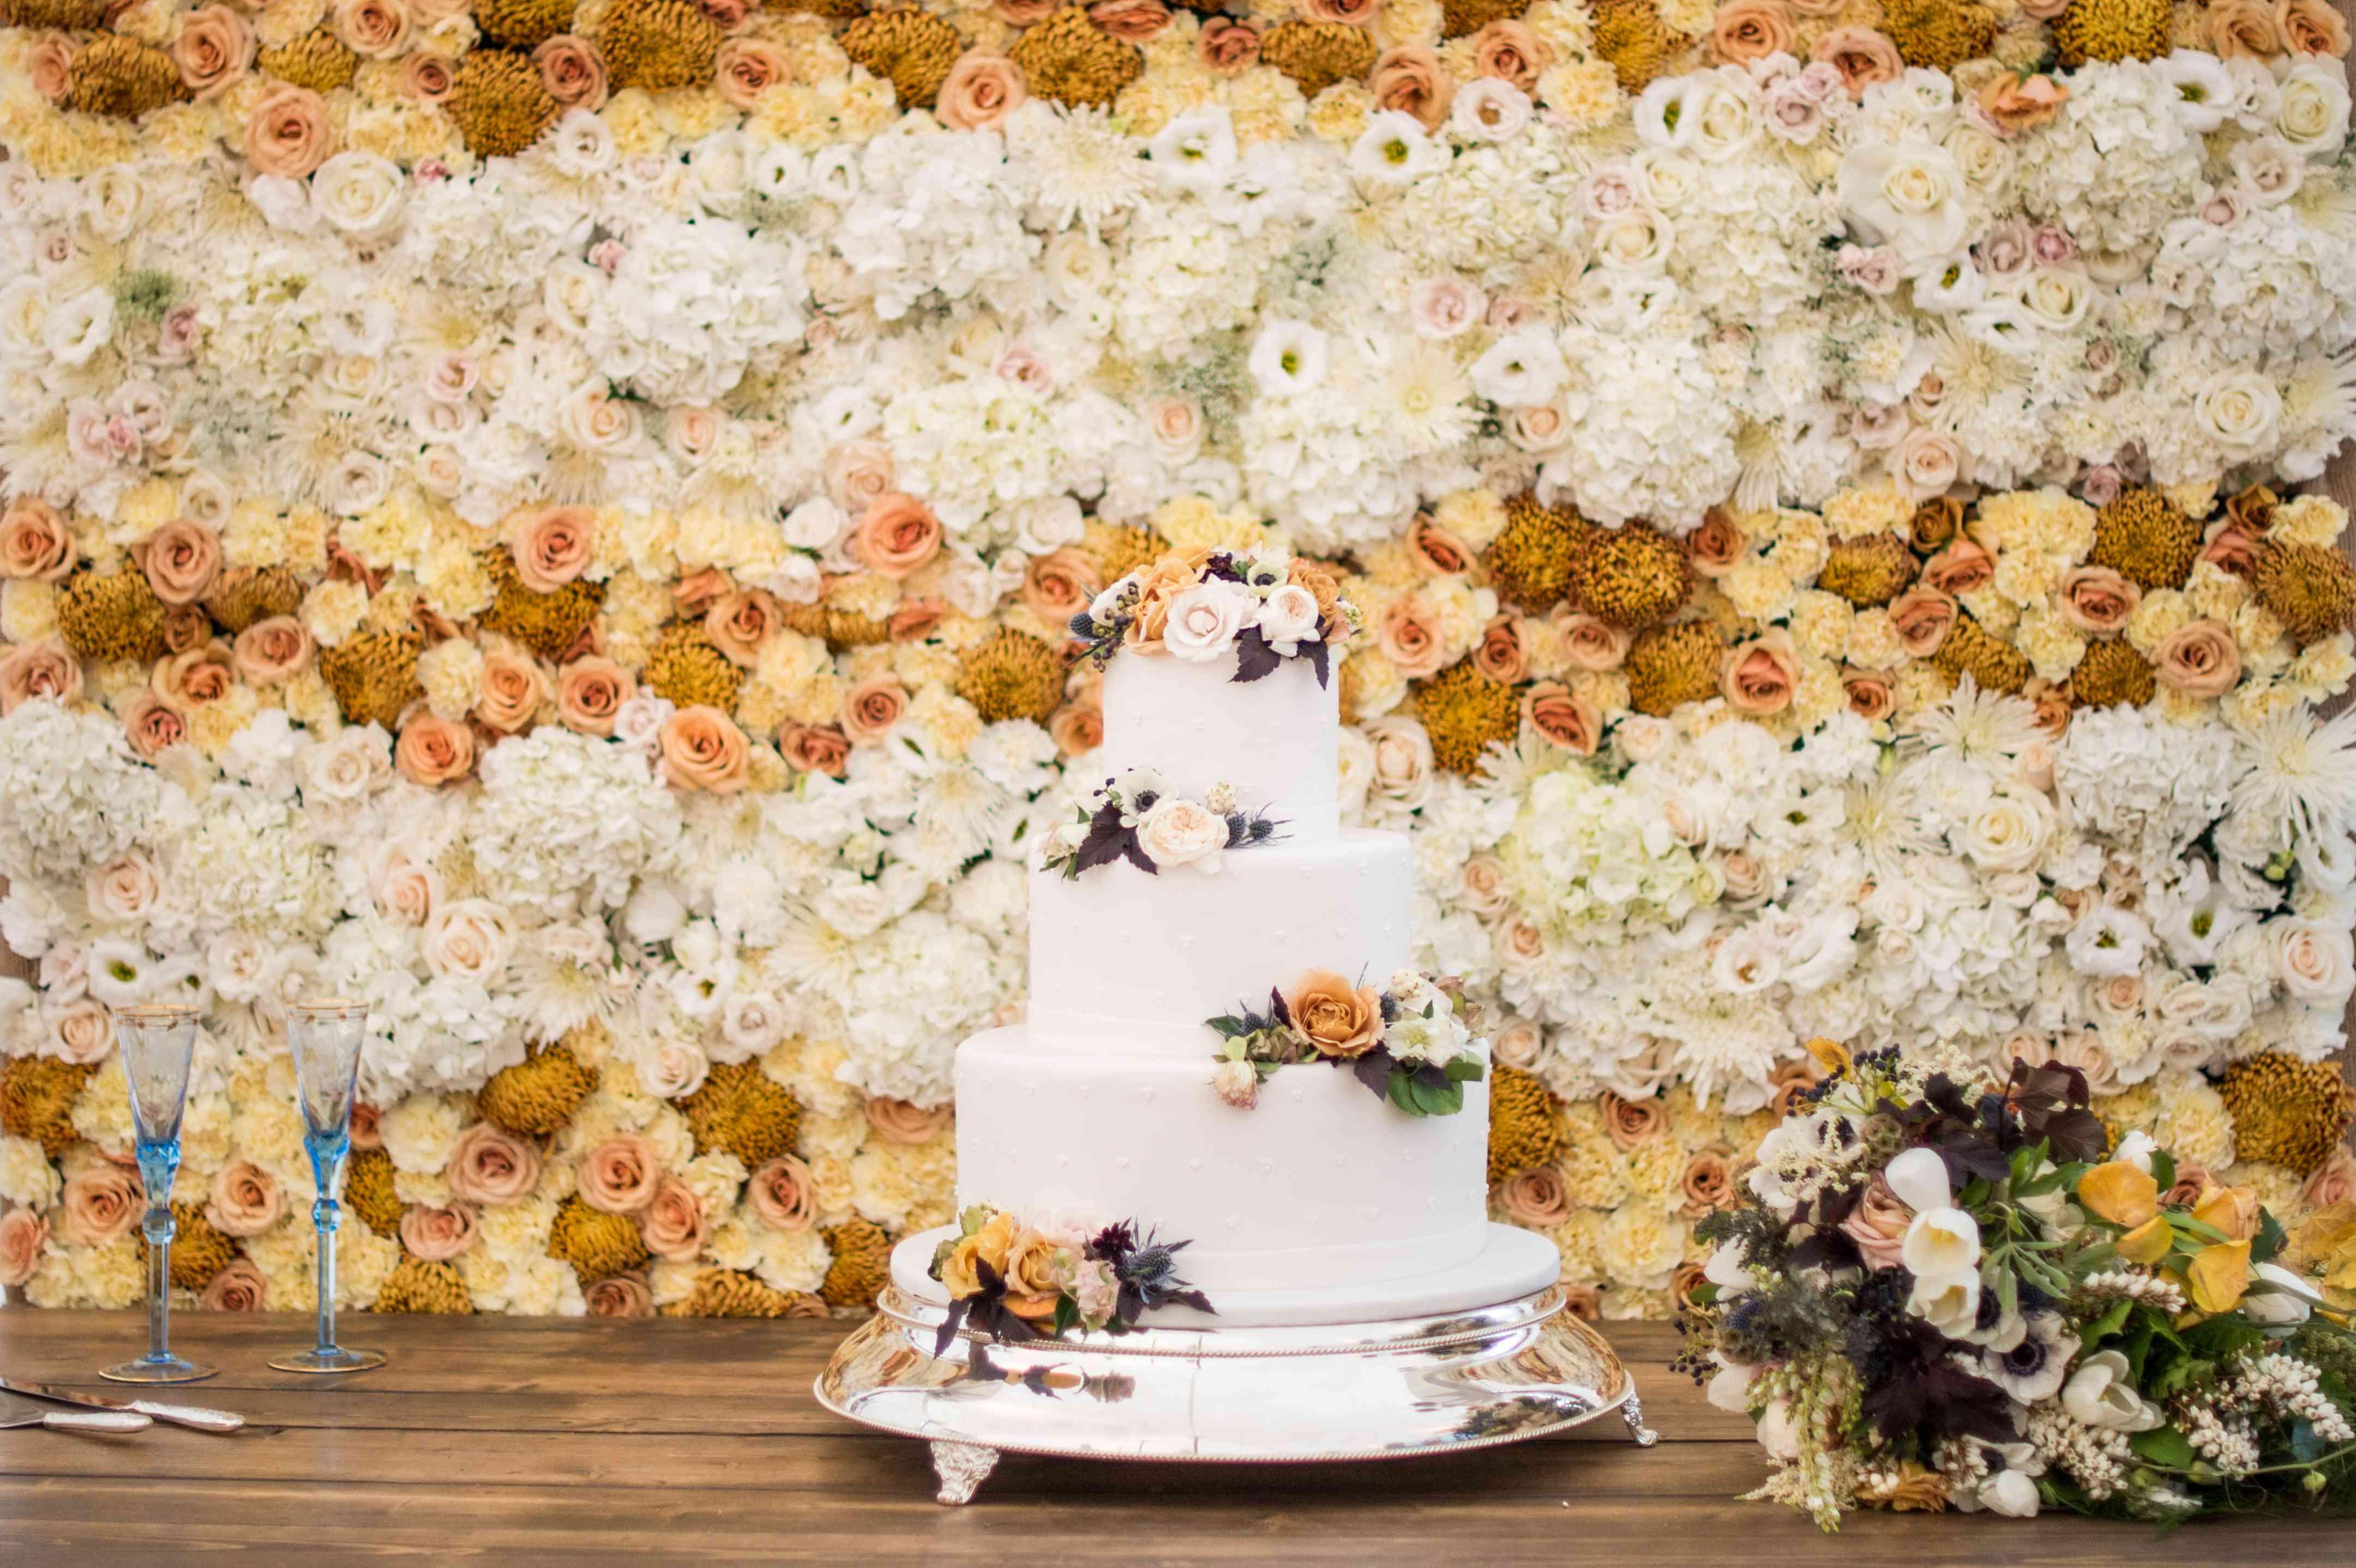 Three-Tiered White Wedding Cake with Fresh Flowers